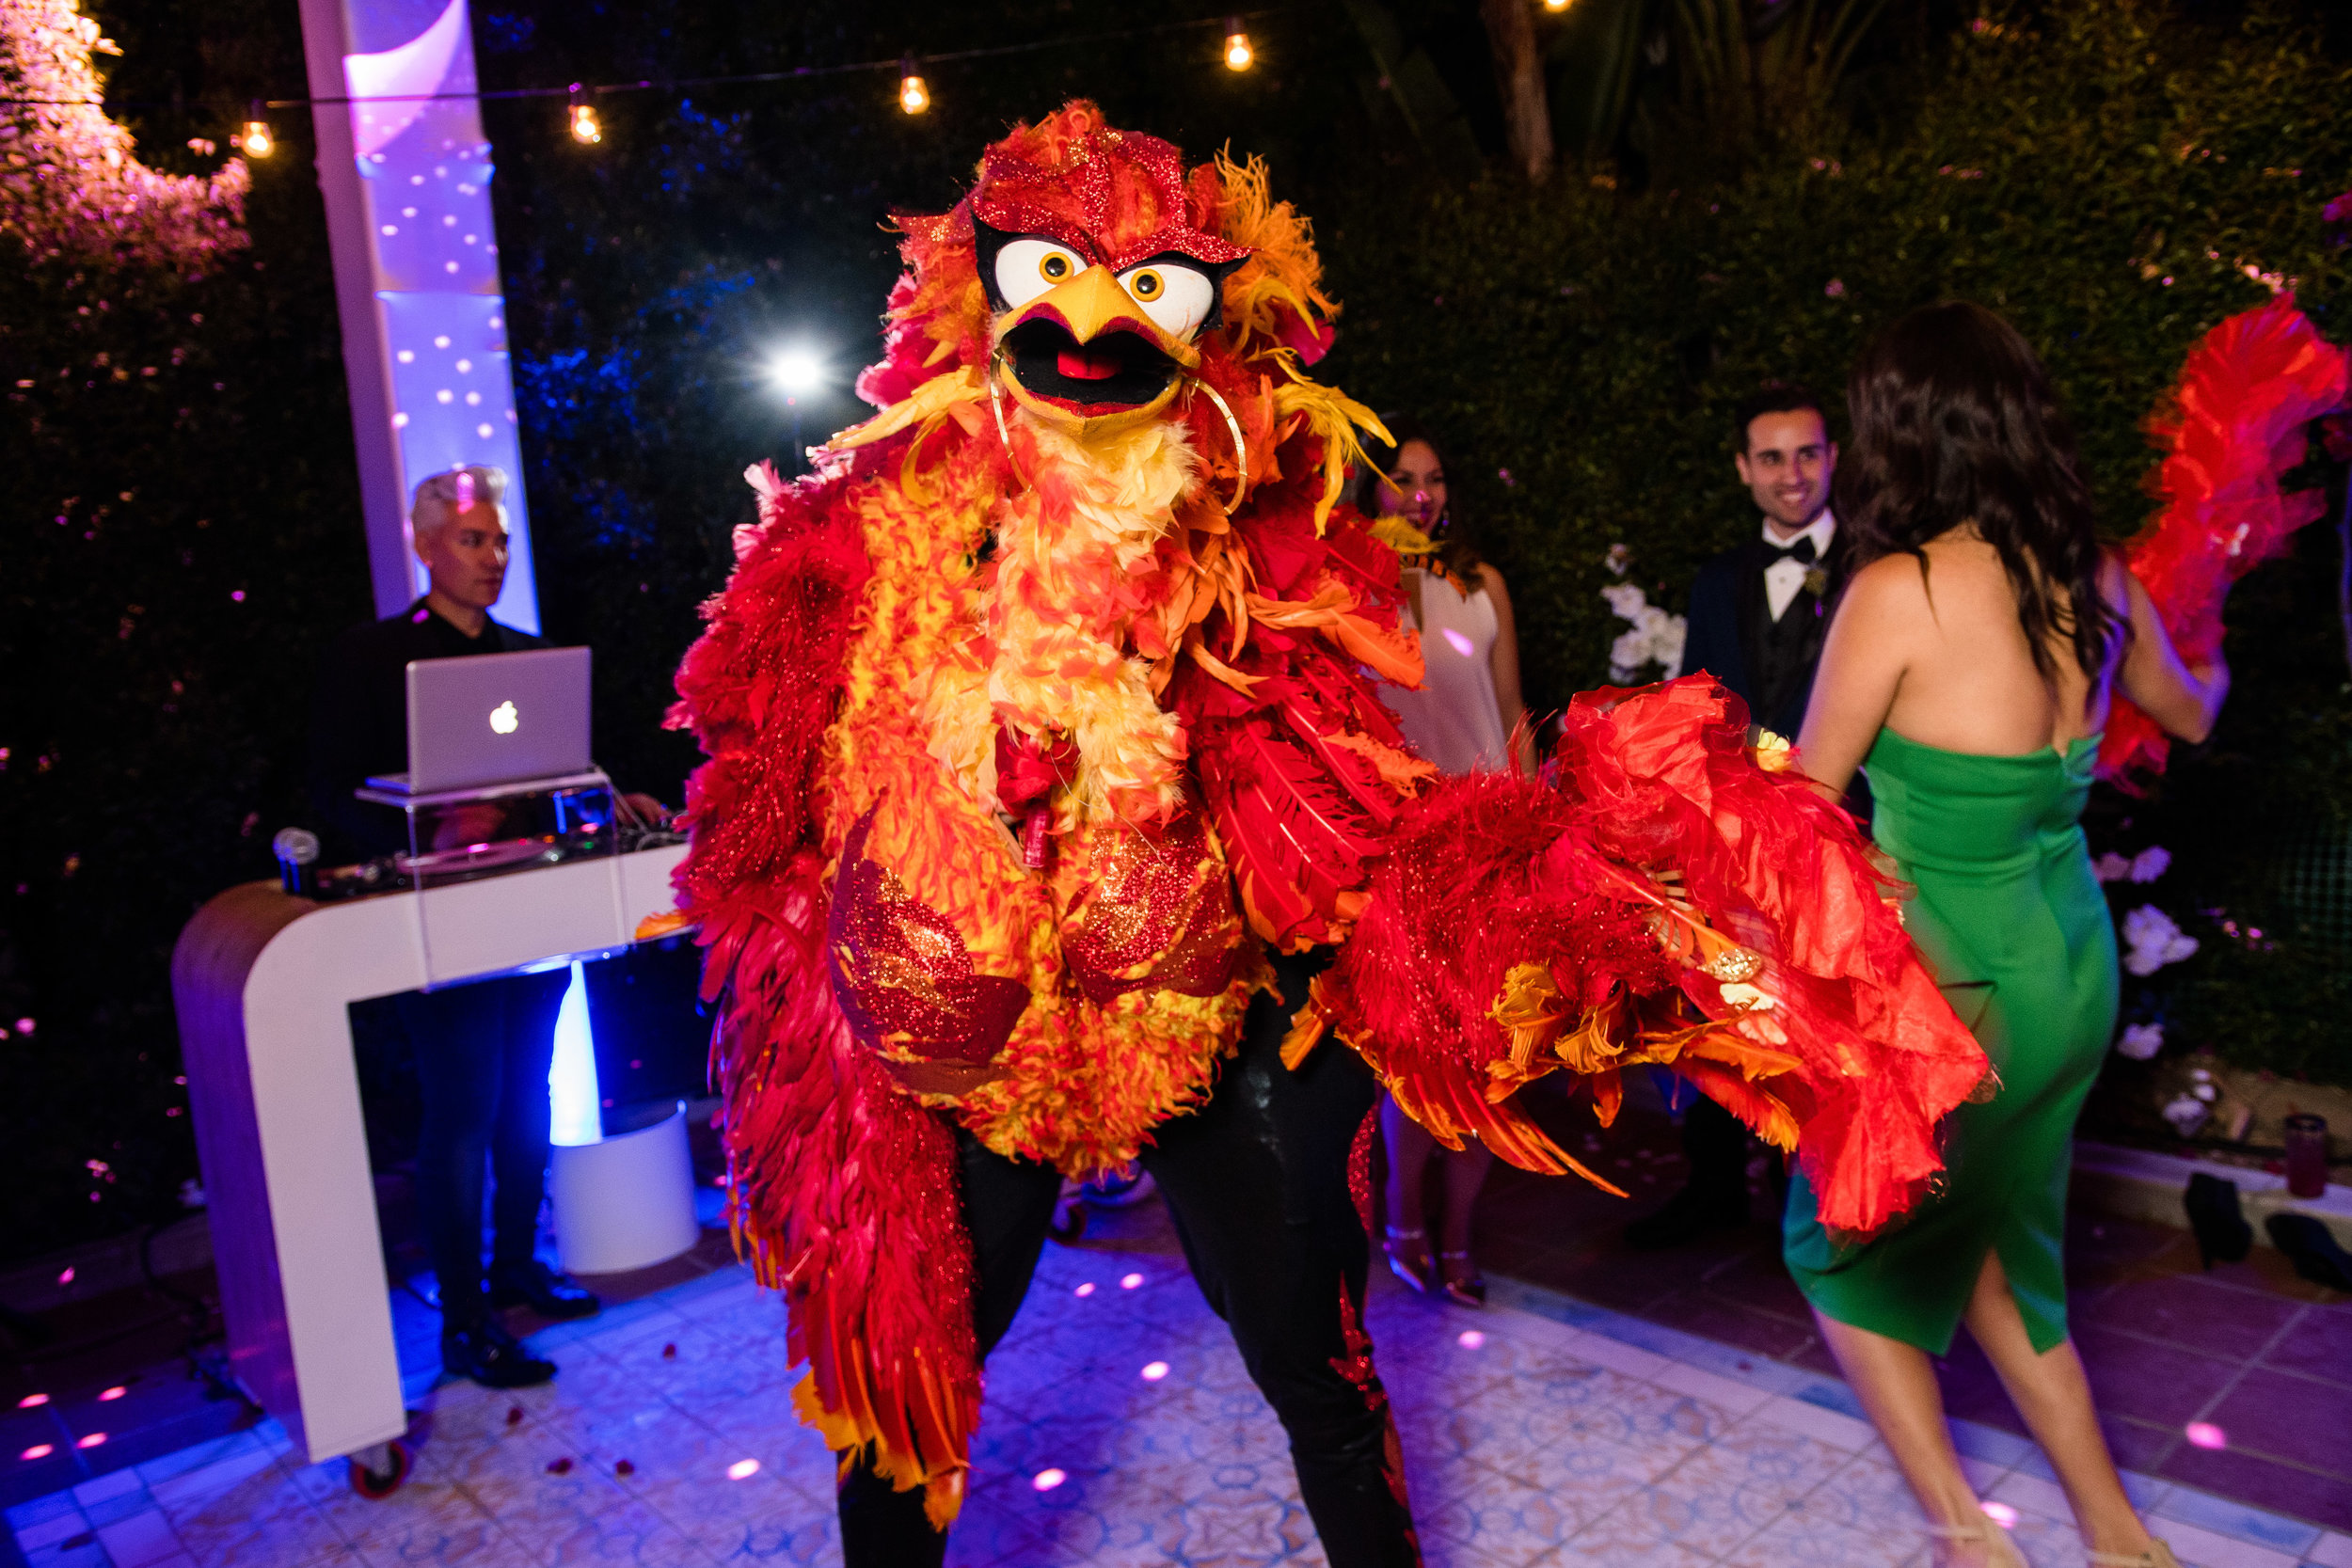 Vibrant Fiesta Backyard Wedding Reception miss fuego dancing with matron of honor.jpg